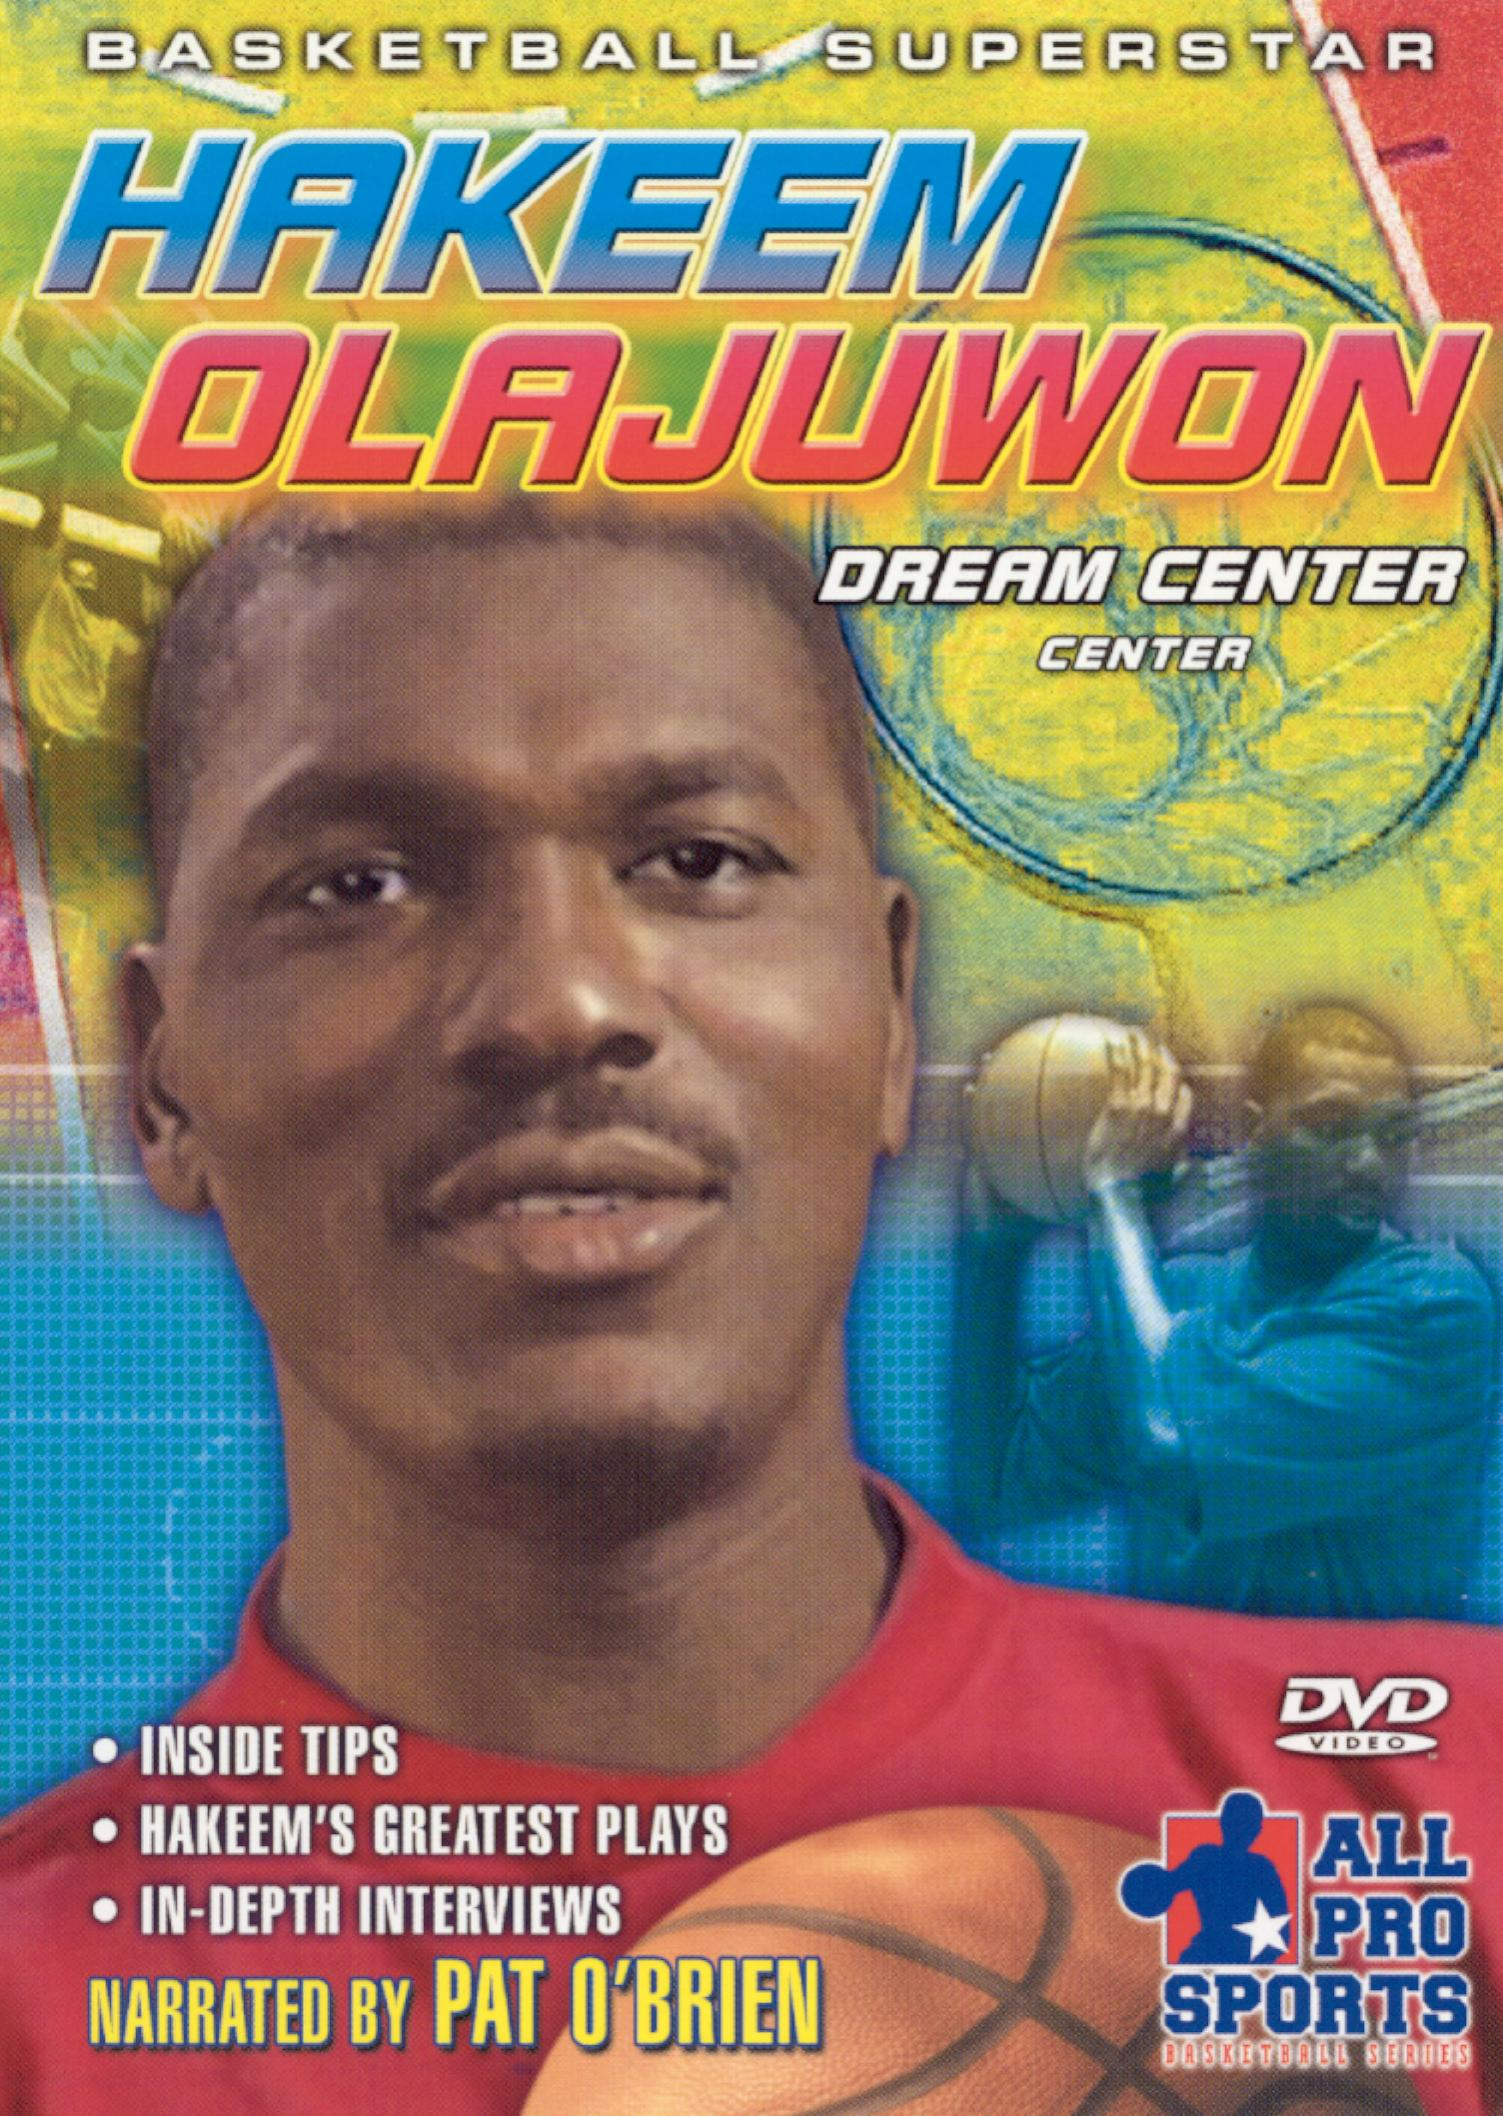 All Pro Sports Basketball Series: Hakeem Olajuwon - Dream Center